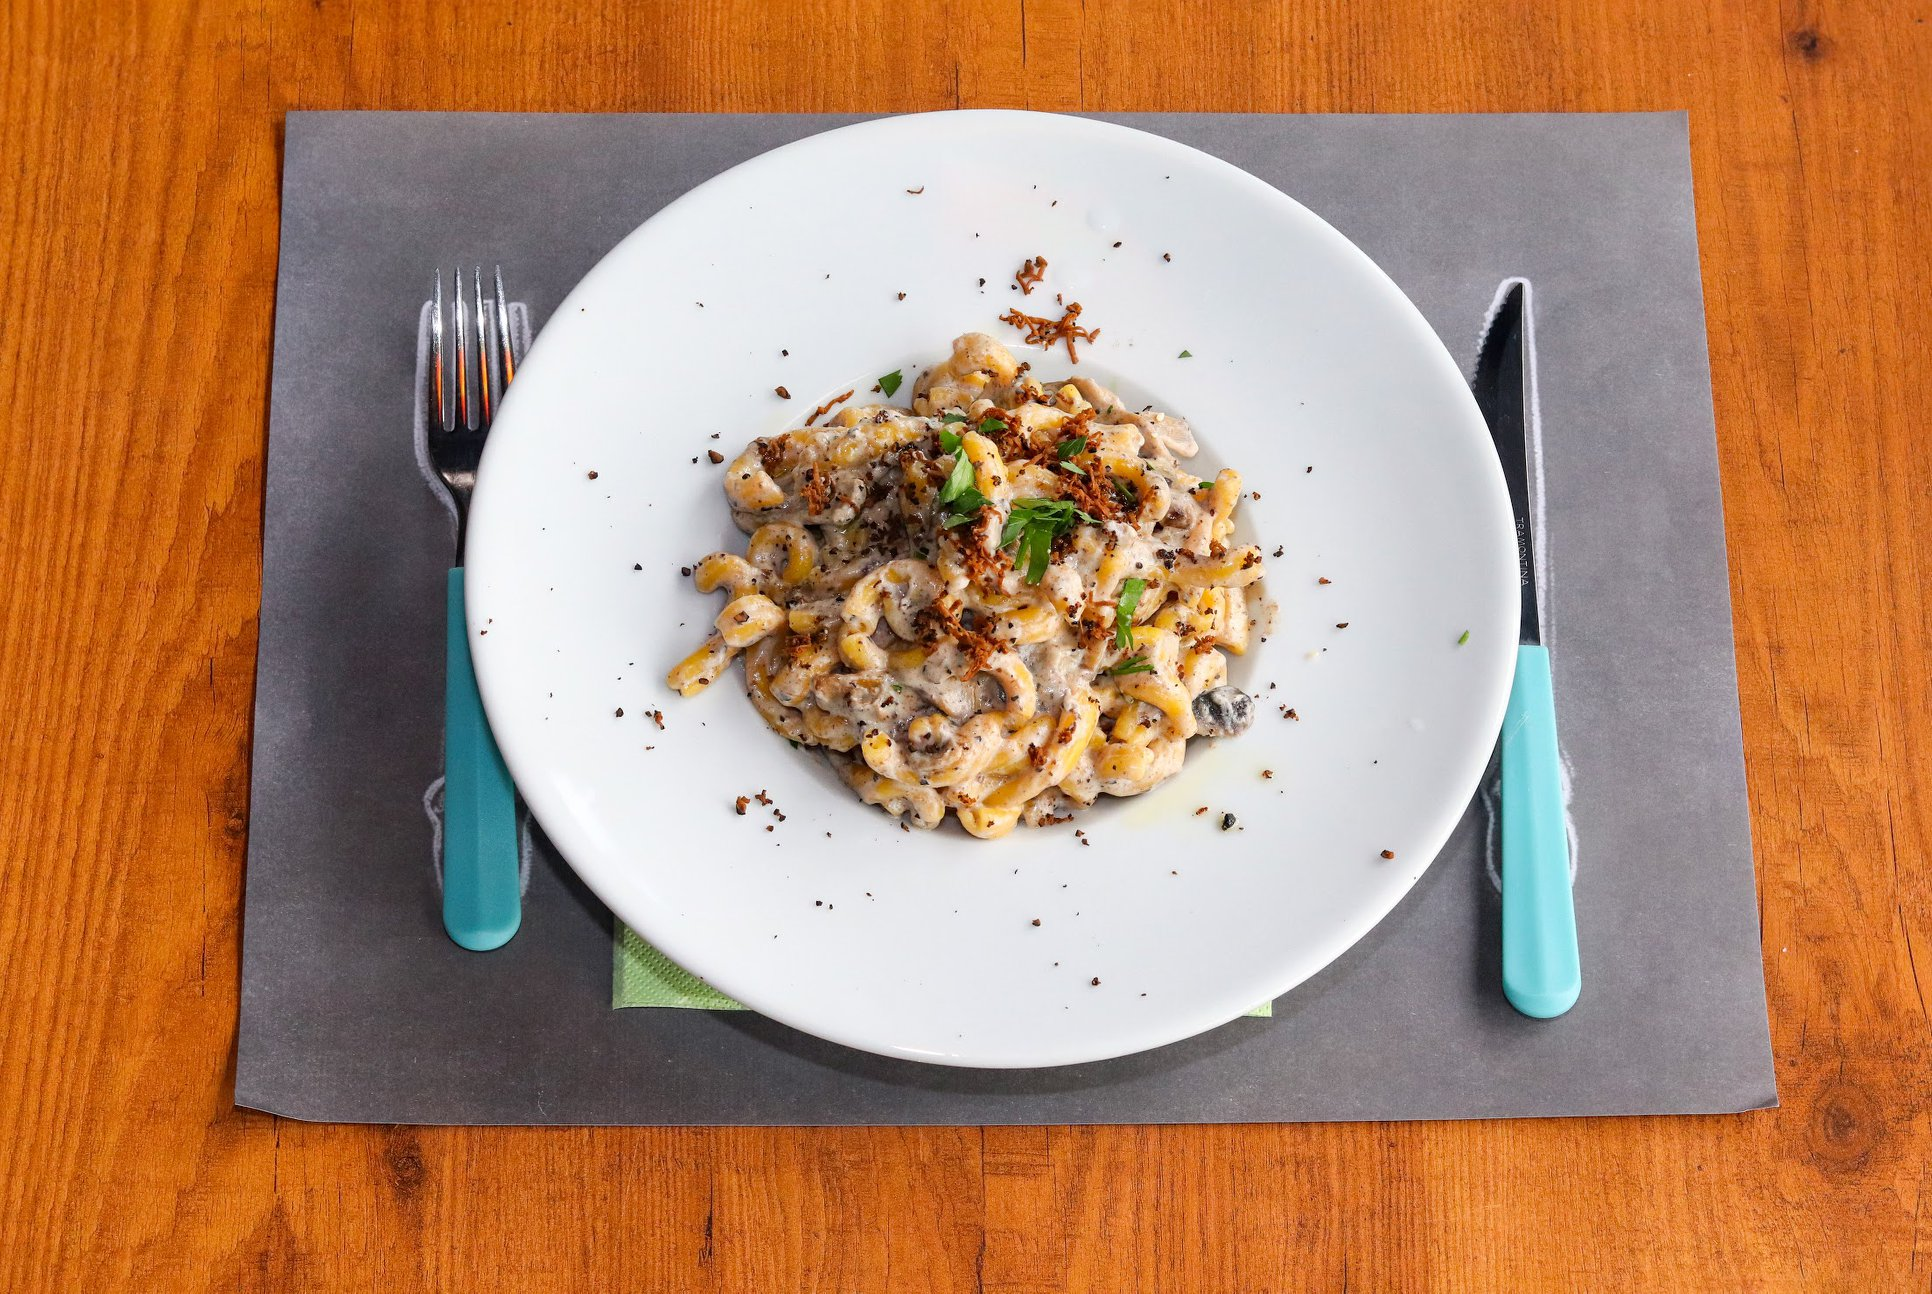 Mushroom Truffled Strozzapreti